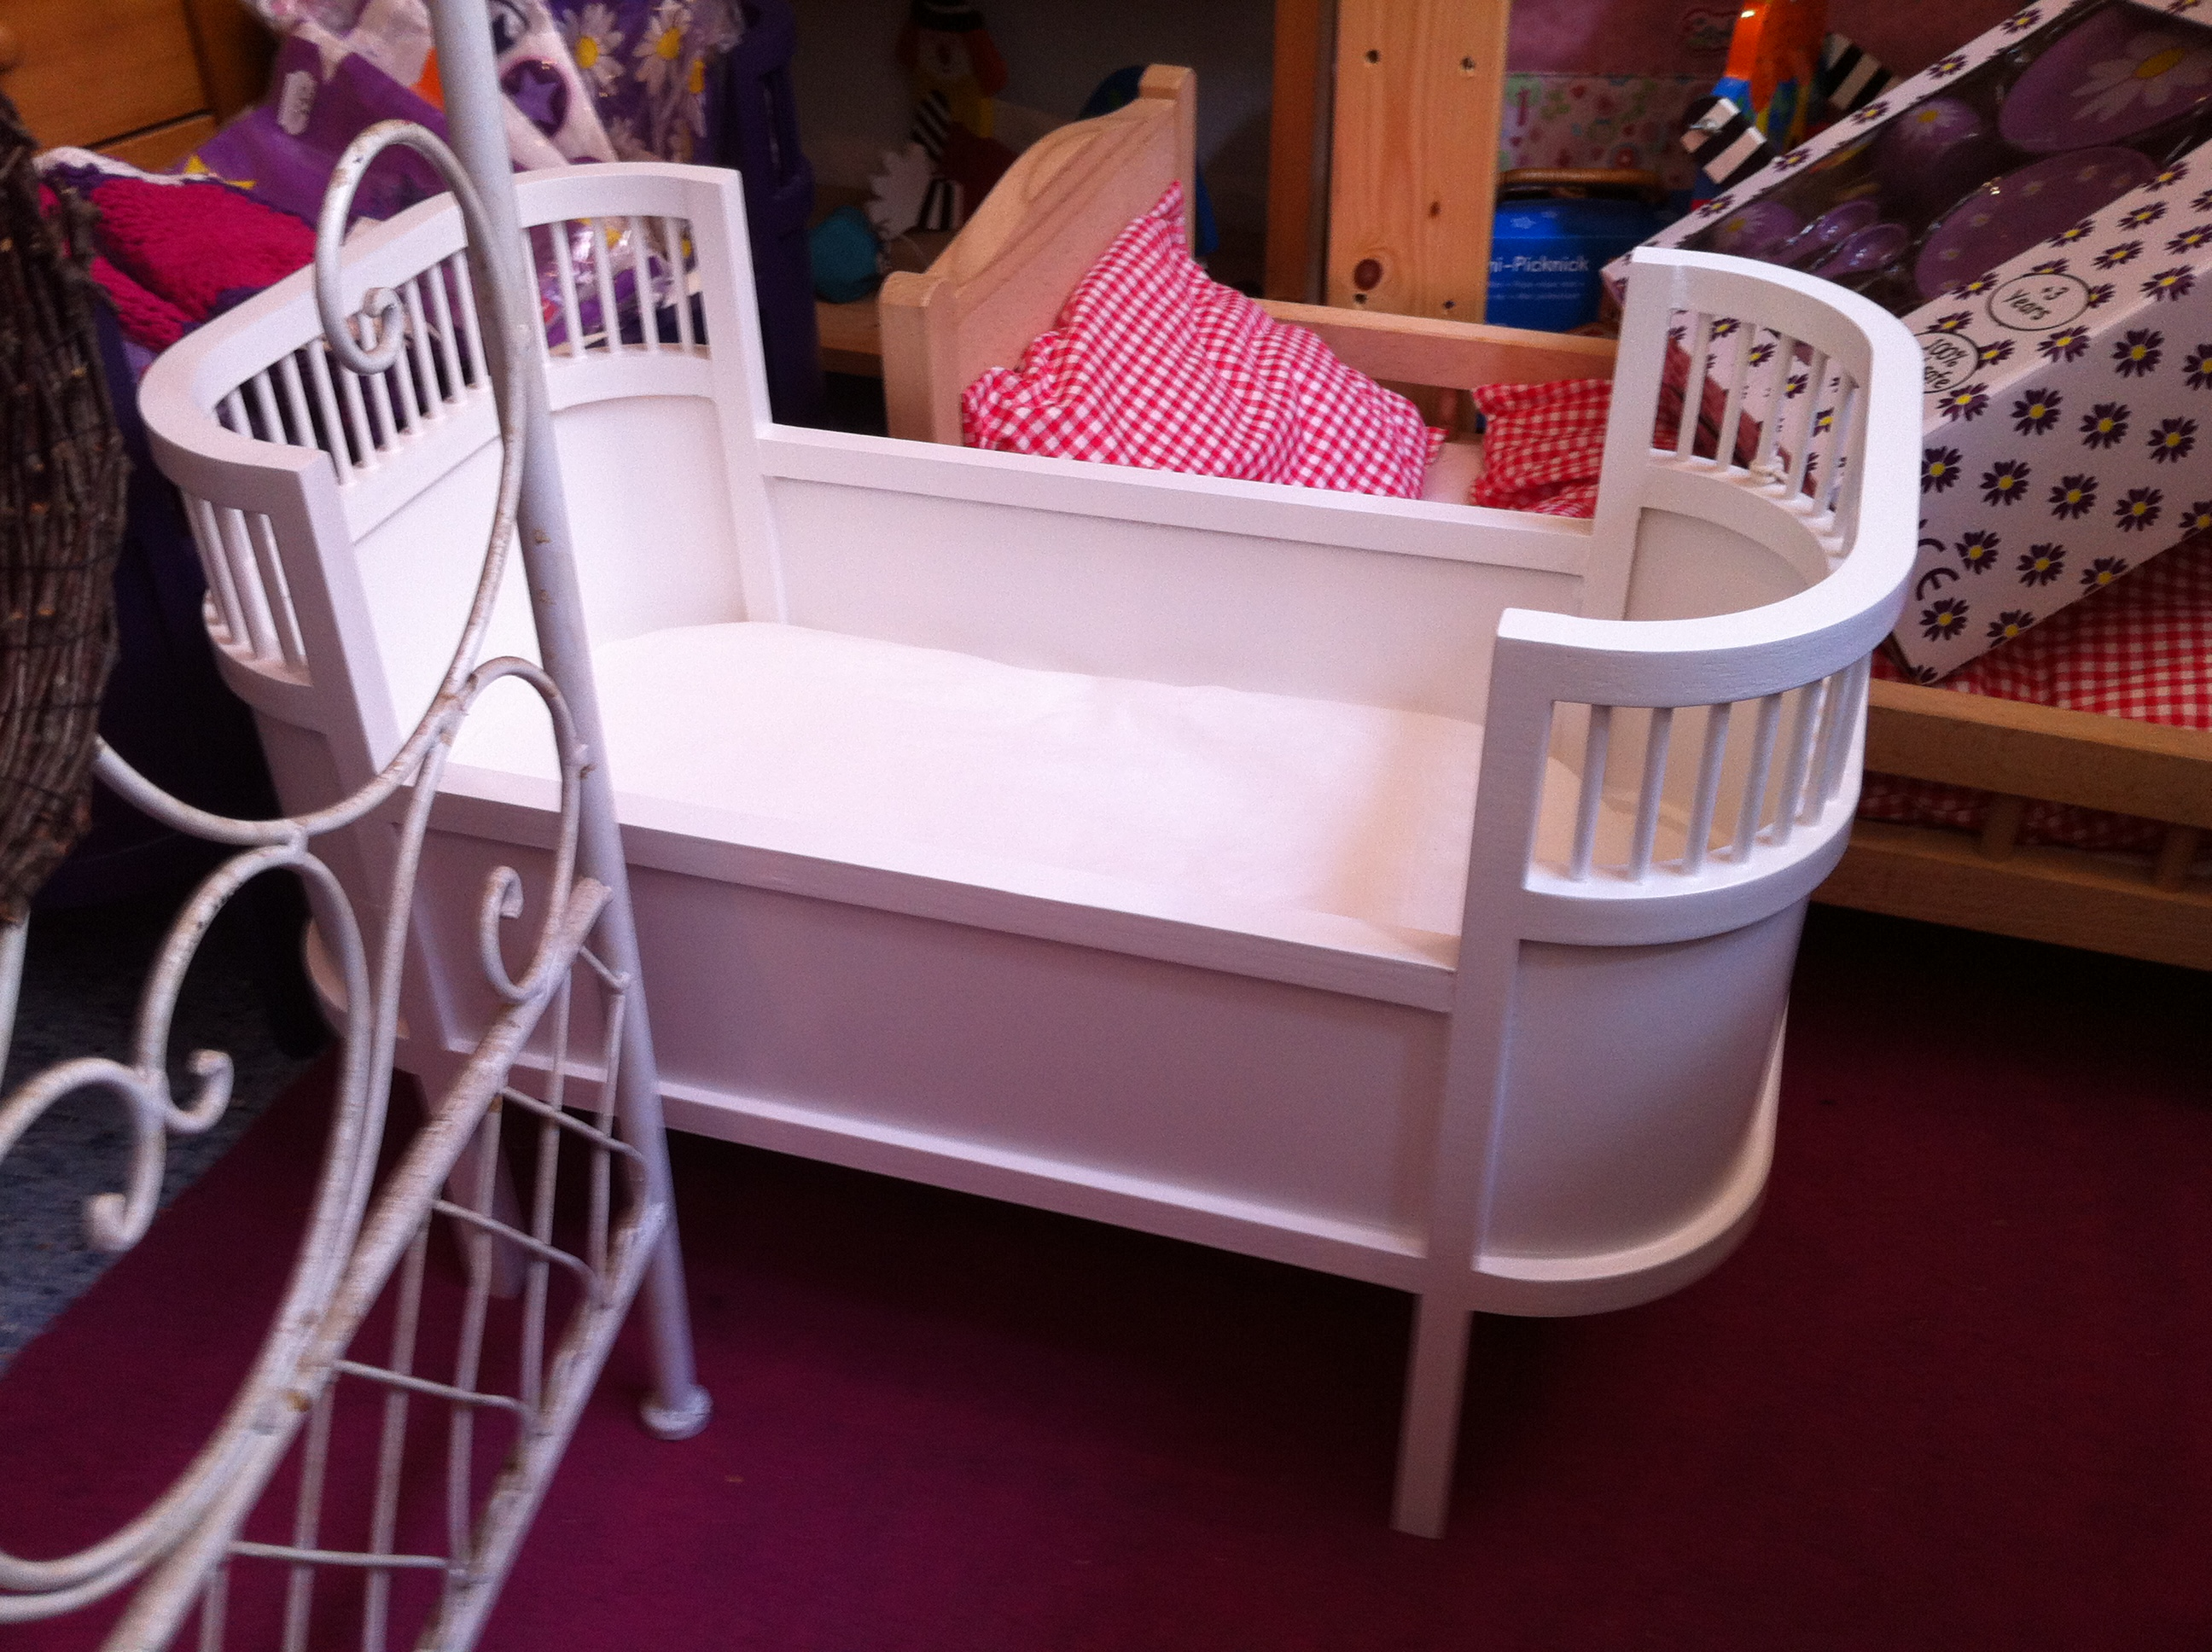 Puppenetagenbett Weiß : Puppenetagenbett katinka pinolino kinderträume